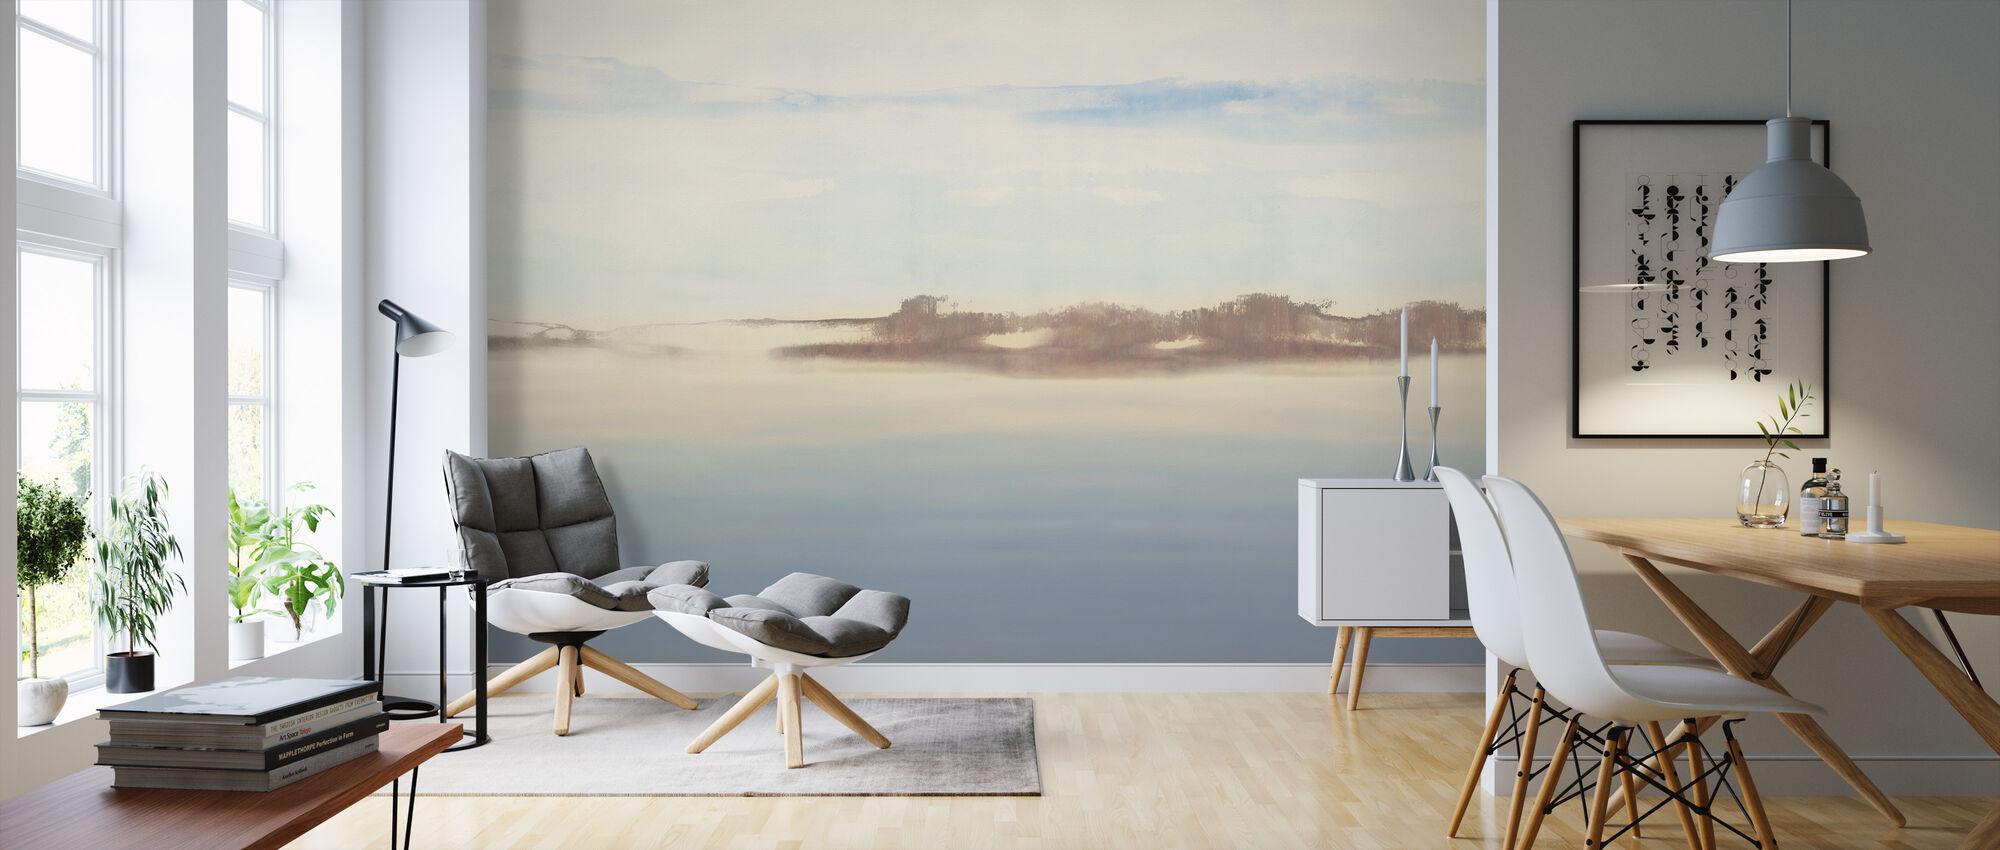 Dreamy Light I - Wallpaper - Living Room